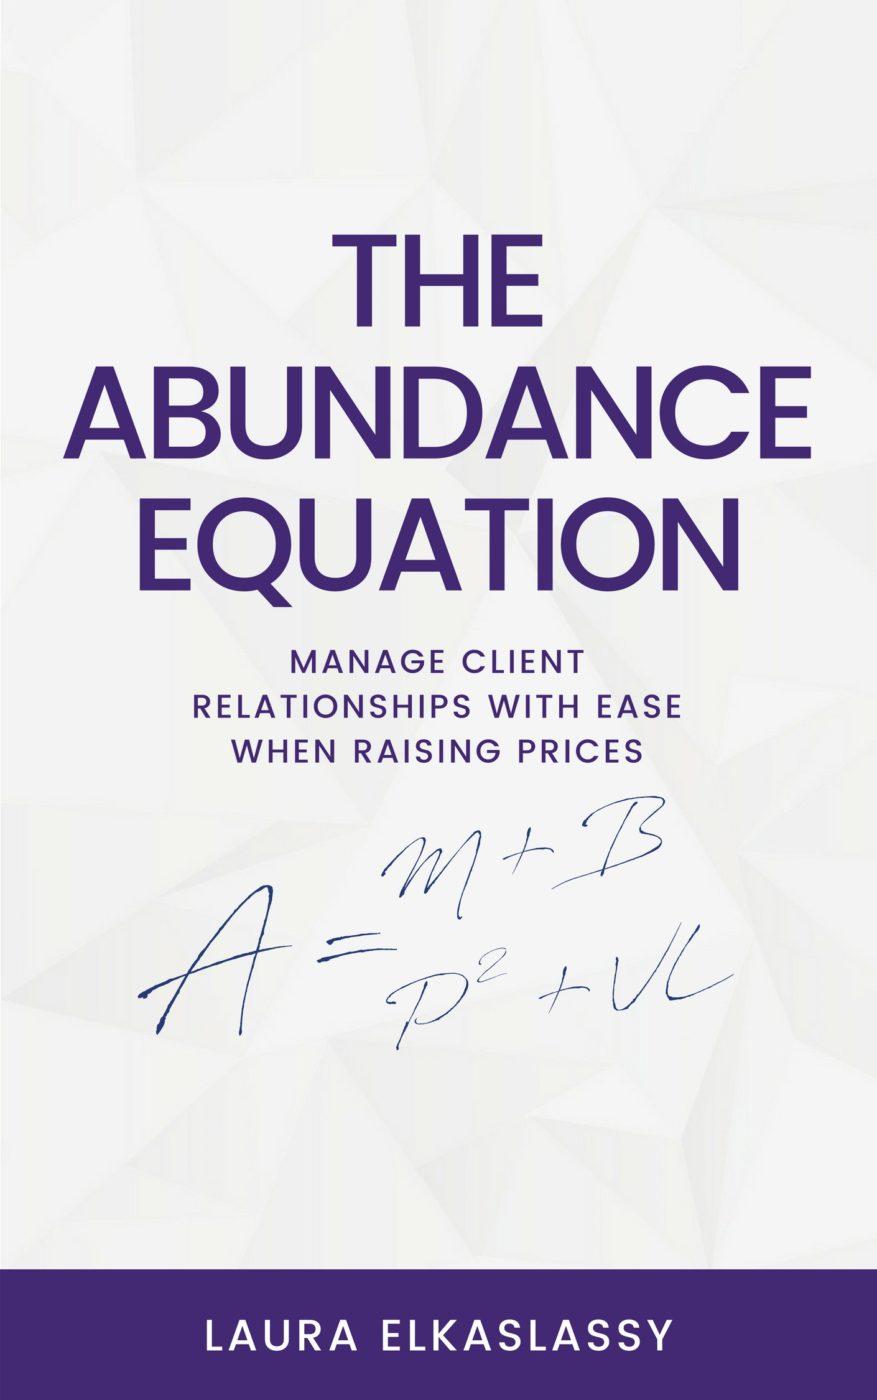 The Abundance Equation - Laura Elkaslassy